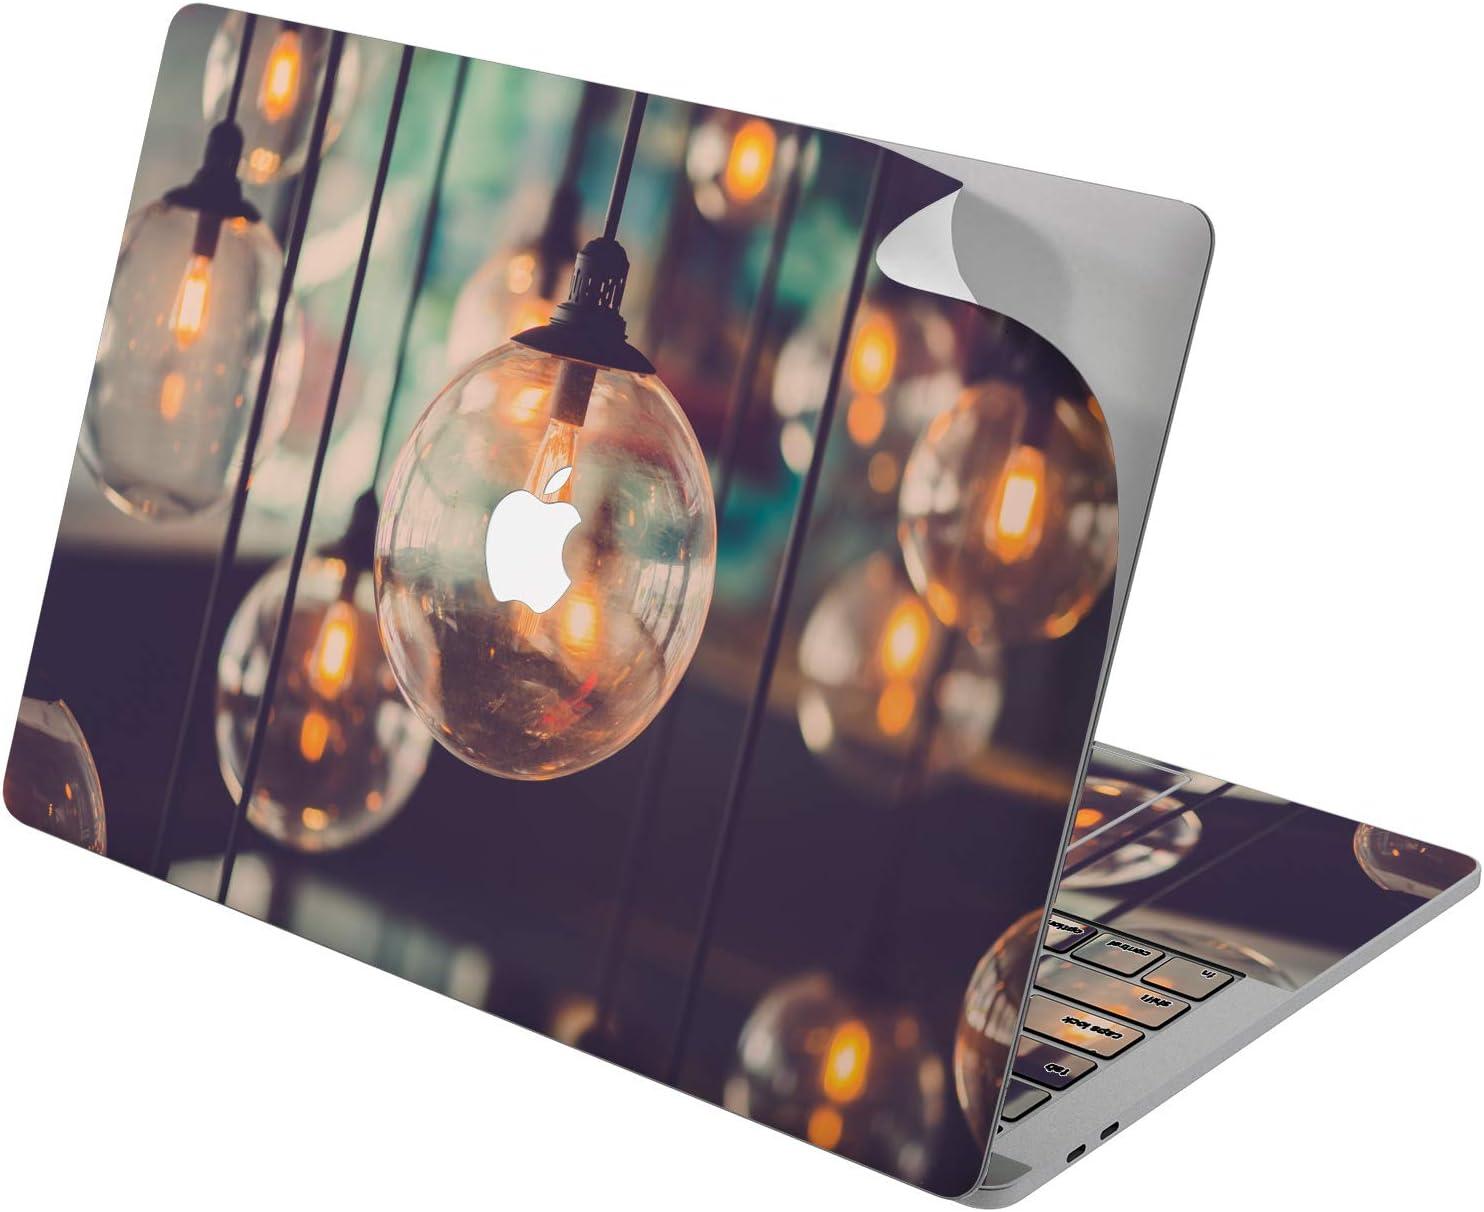 "Cavka Vinyl Decal Skin for Apple MacBook Pro 13"" 2019 15"" 2018 Air 13"" 2020 Retina 2015 Mac 11"" Mac 12"" Protective Pattern Light Design Print New Cover Unique Laptop Vintage Sticker Bulbs Lamp Gentle"